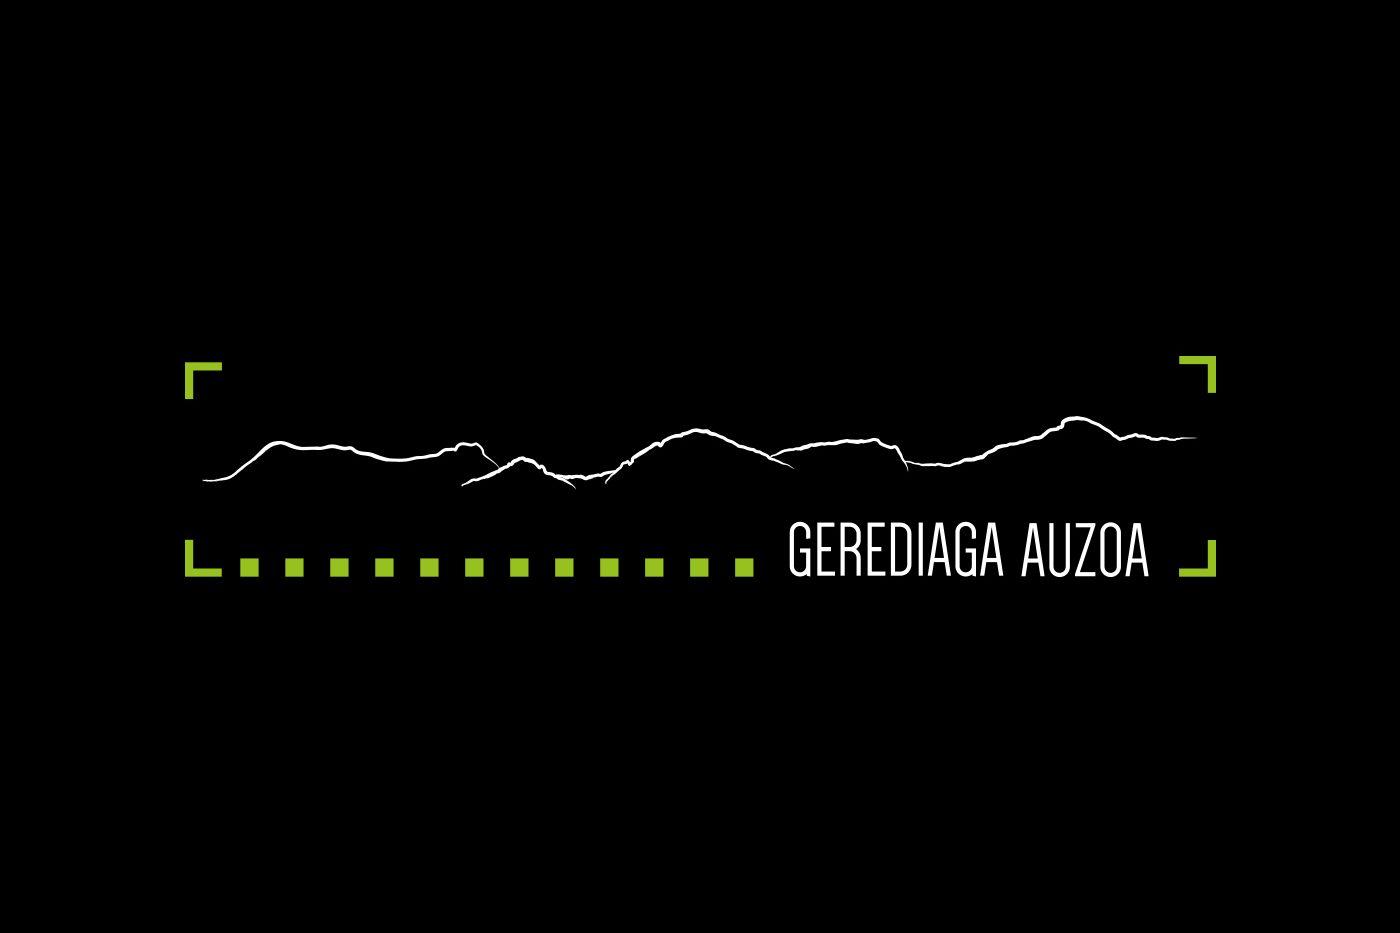 gerediaga_kamia_irudia